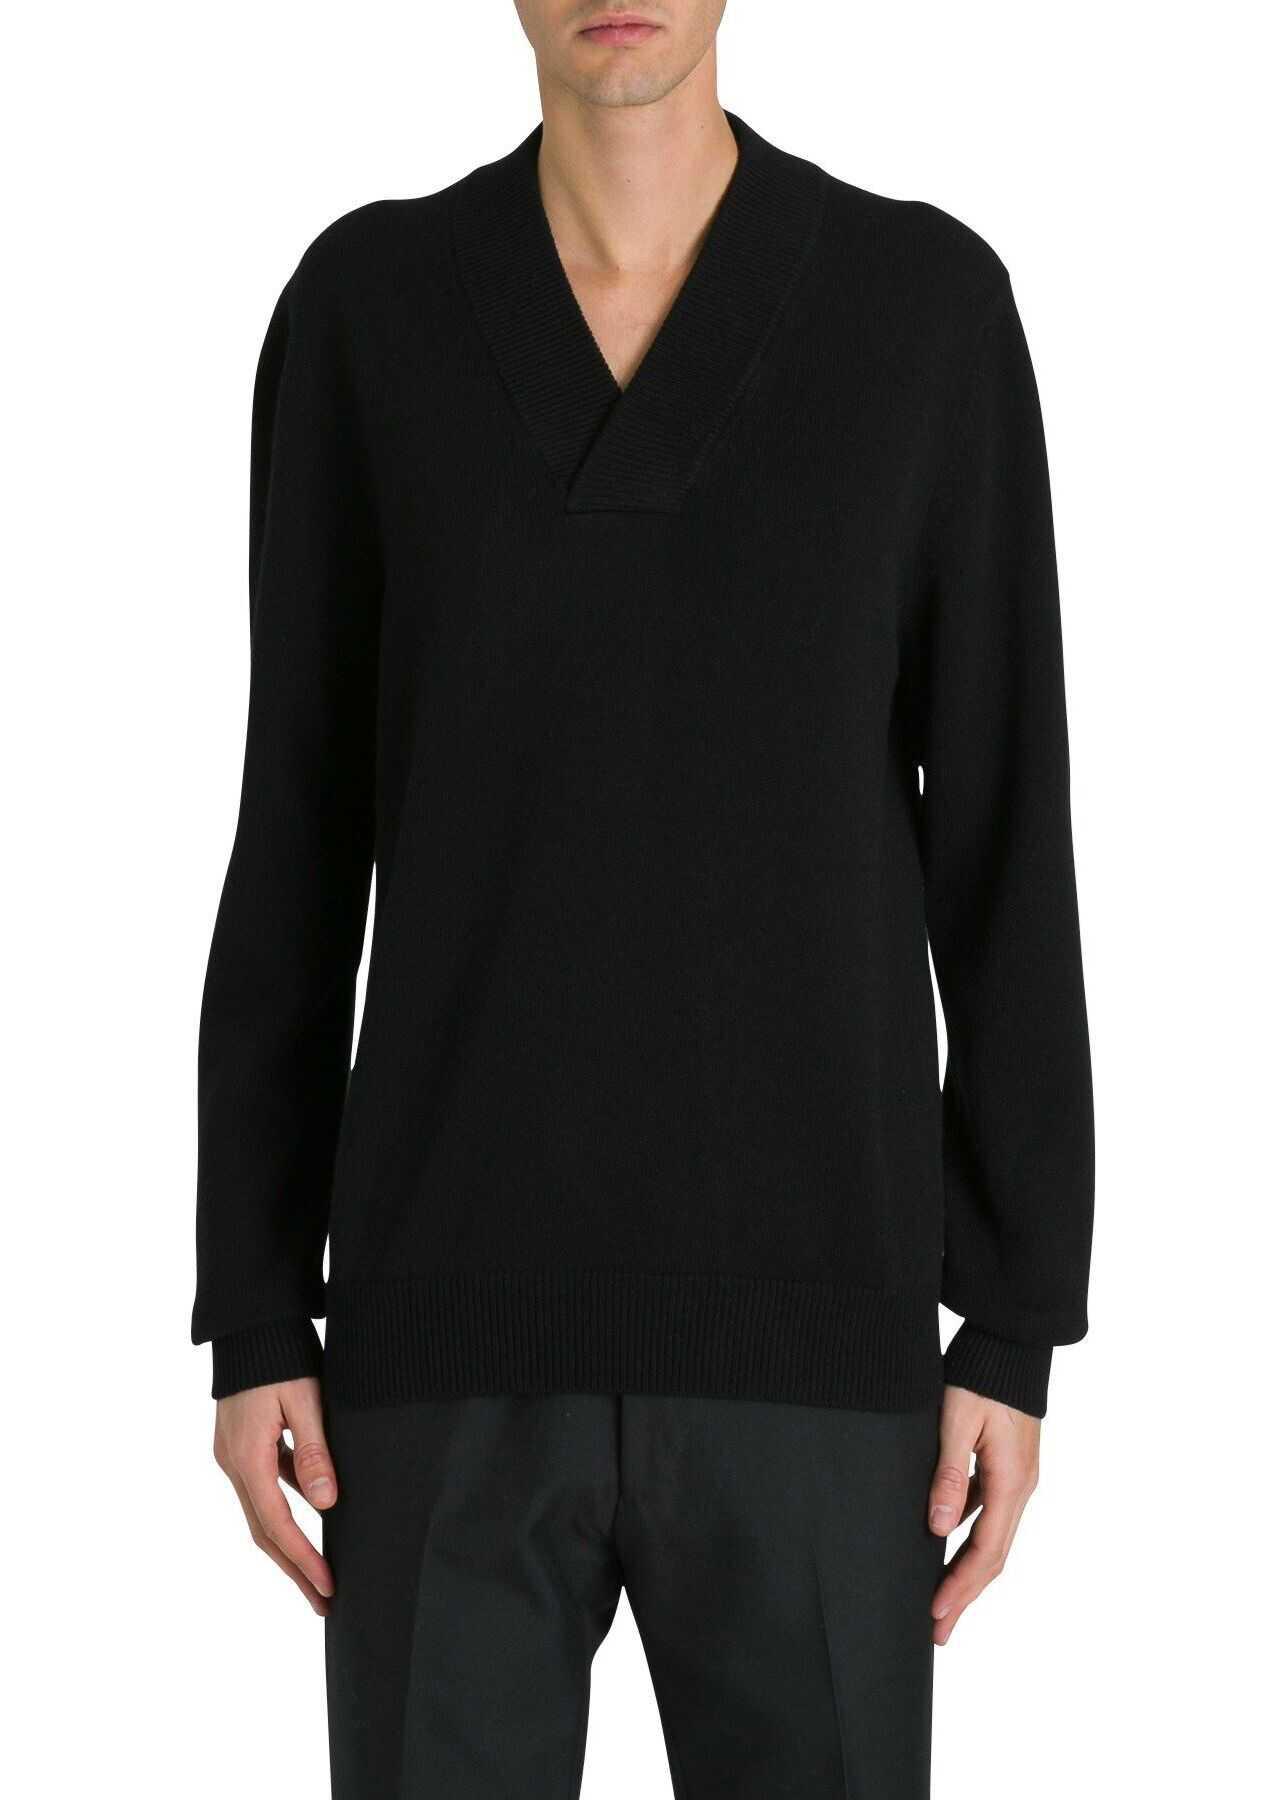 Dolce & Gabbana Wool Sweater BLACK